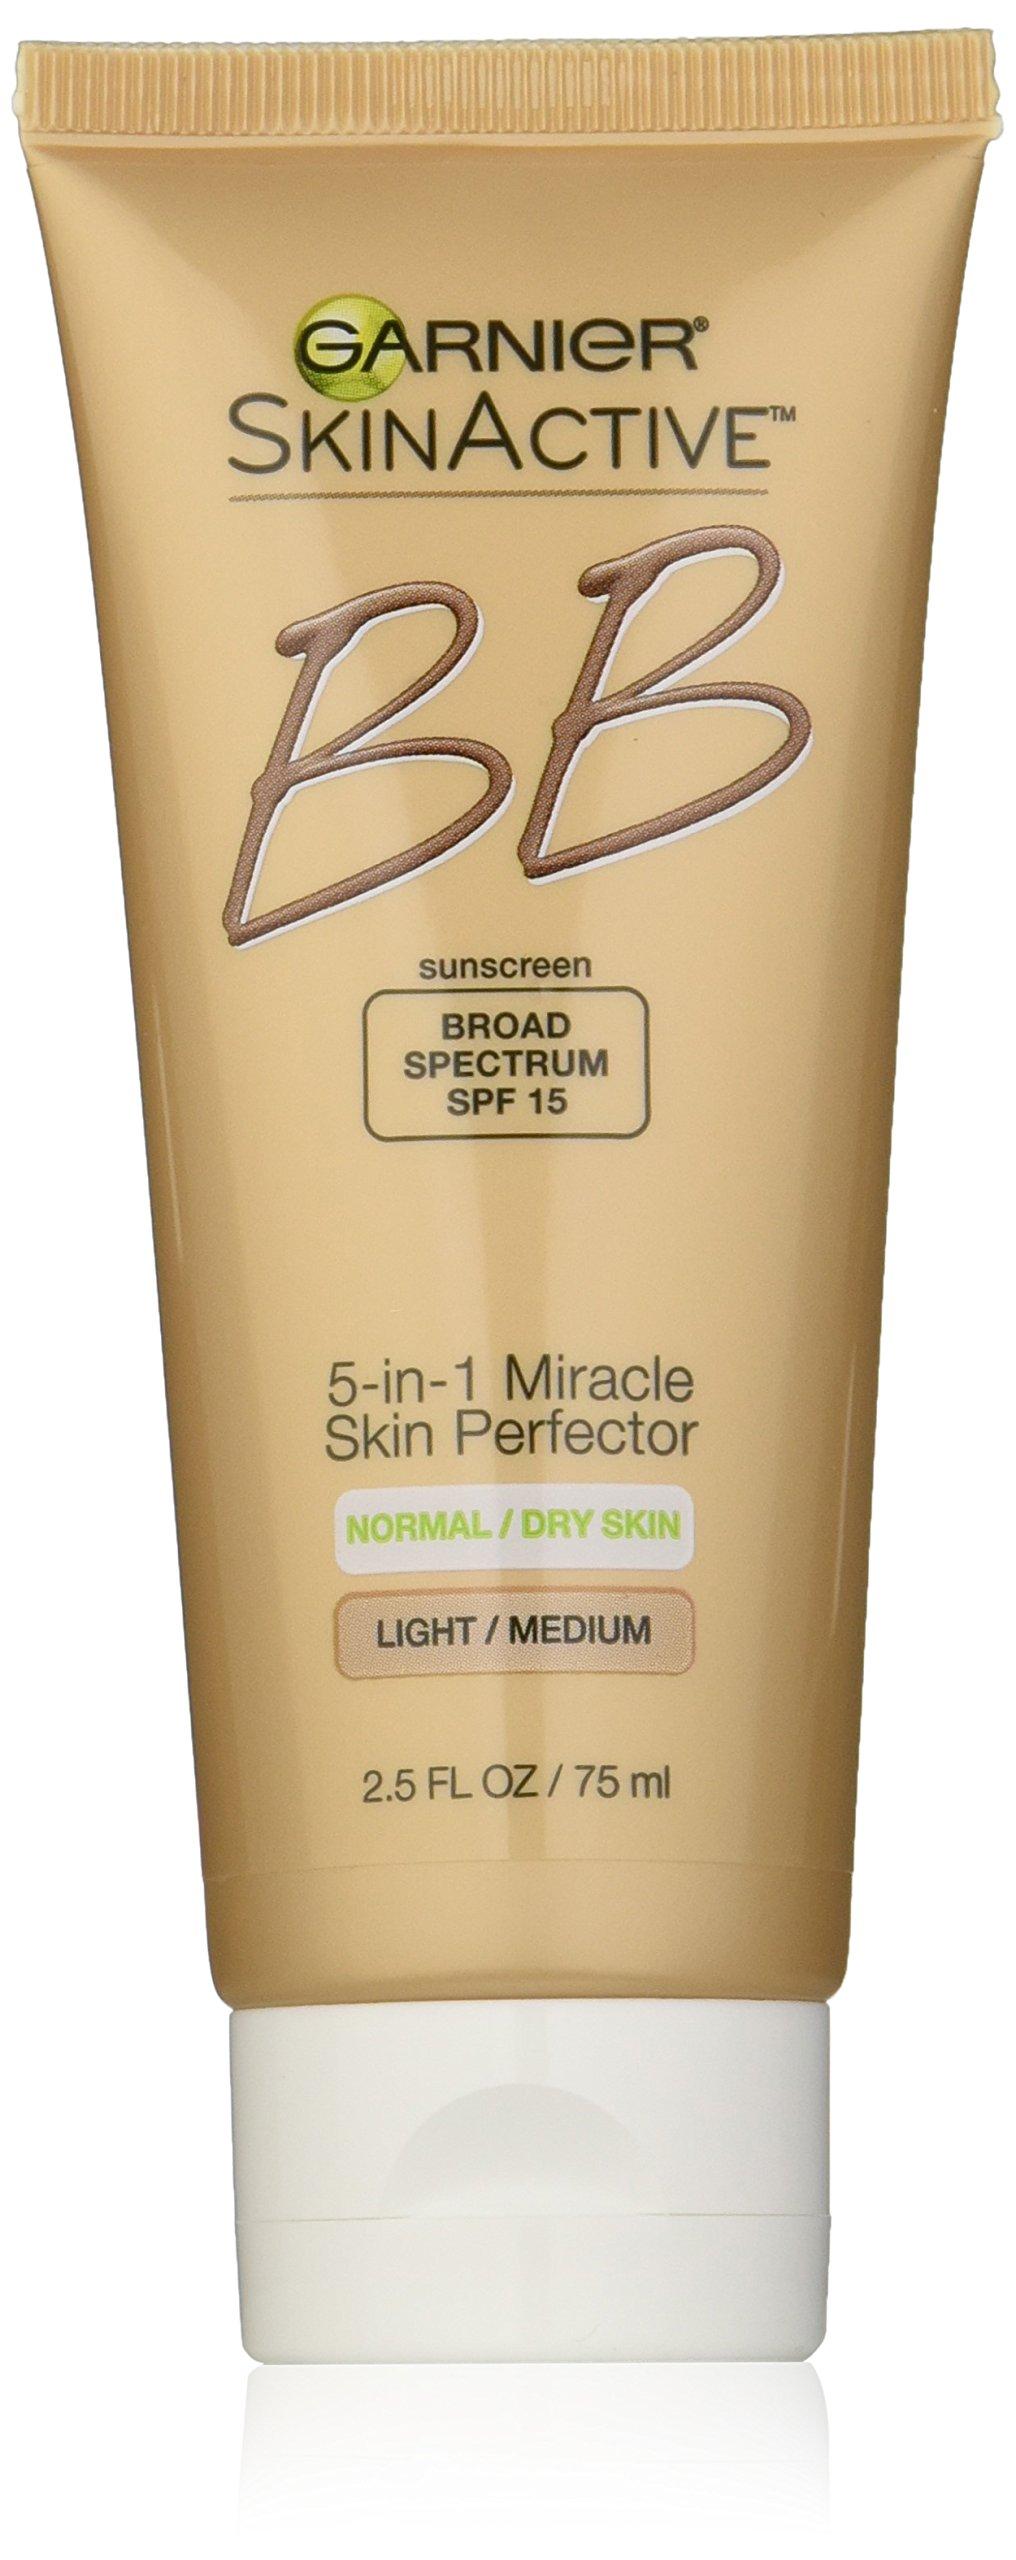 Garnier Skin Renew Miracle Skin Perfector B.B. Cream, Light and medium, 2.5 Fluid Ounce (Packaging May Vary)